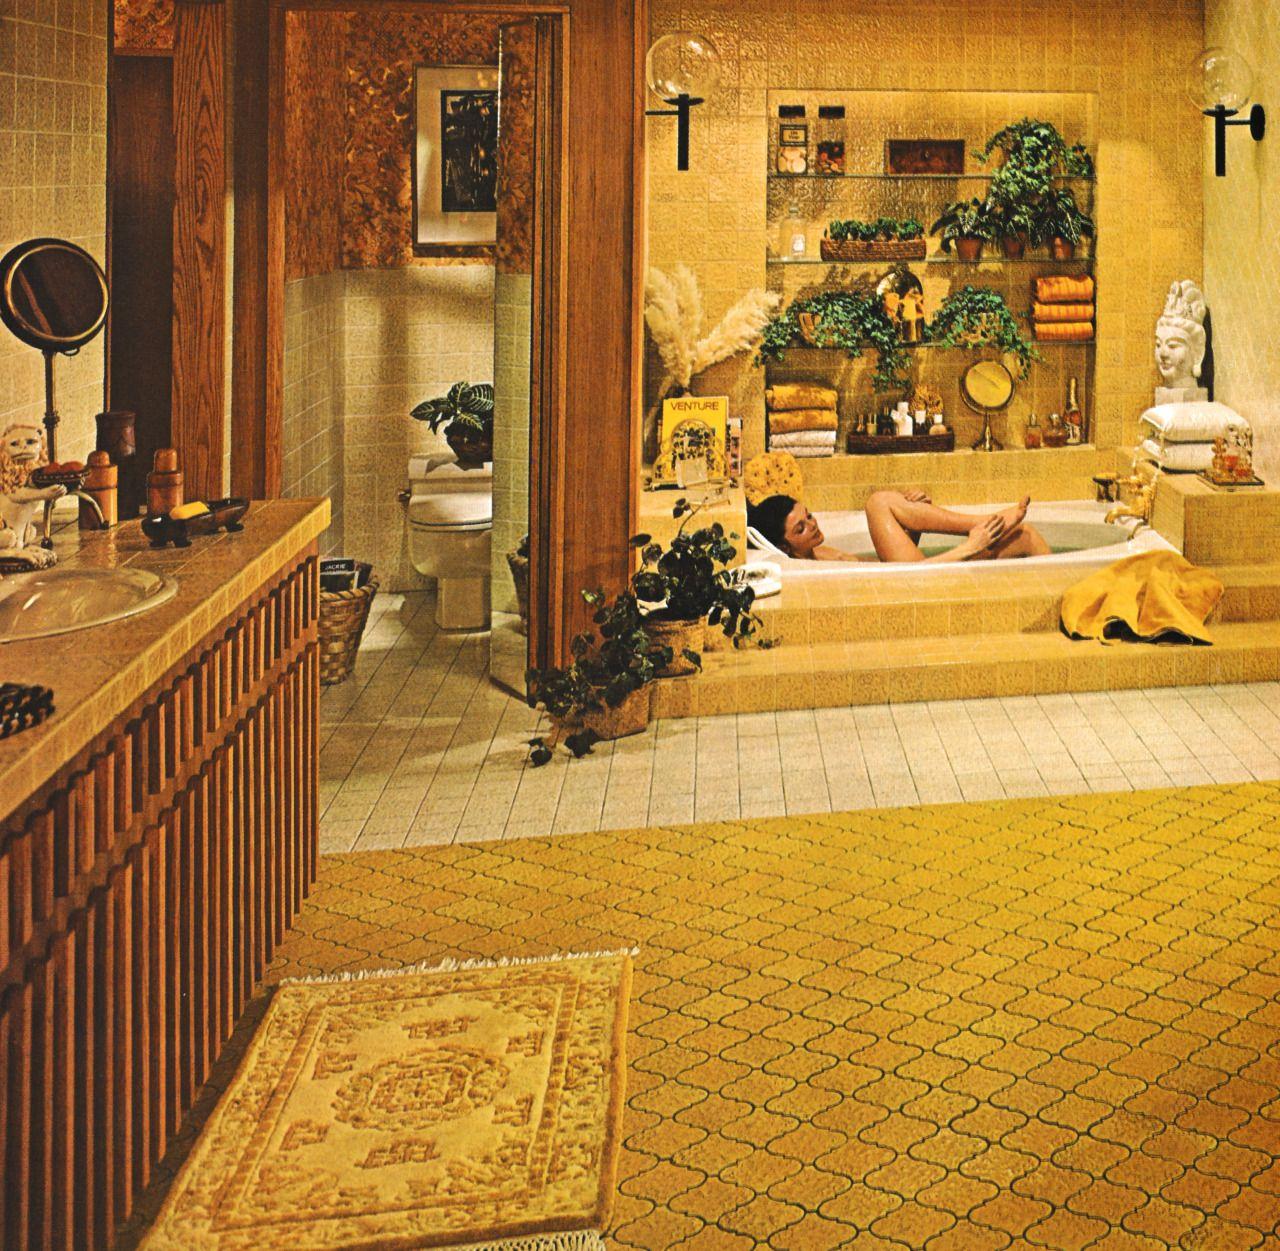 Bathroom Decor 1970s I Love This Bathroom So Much I Wouldn T